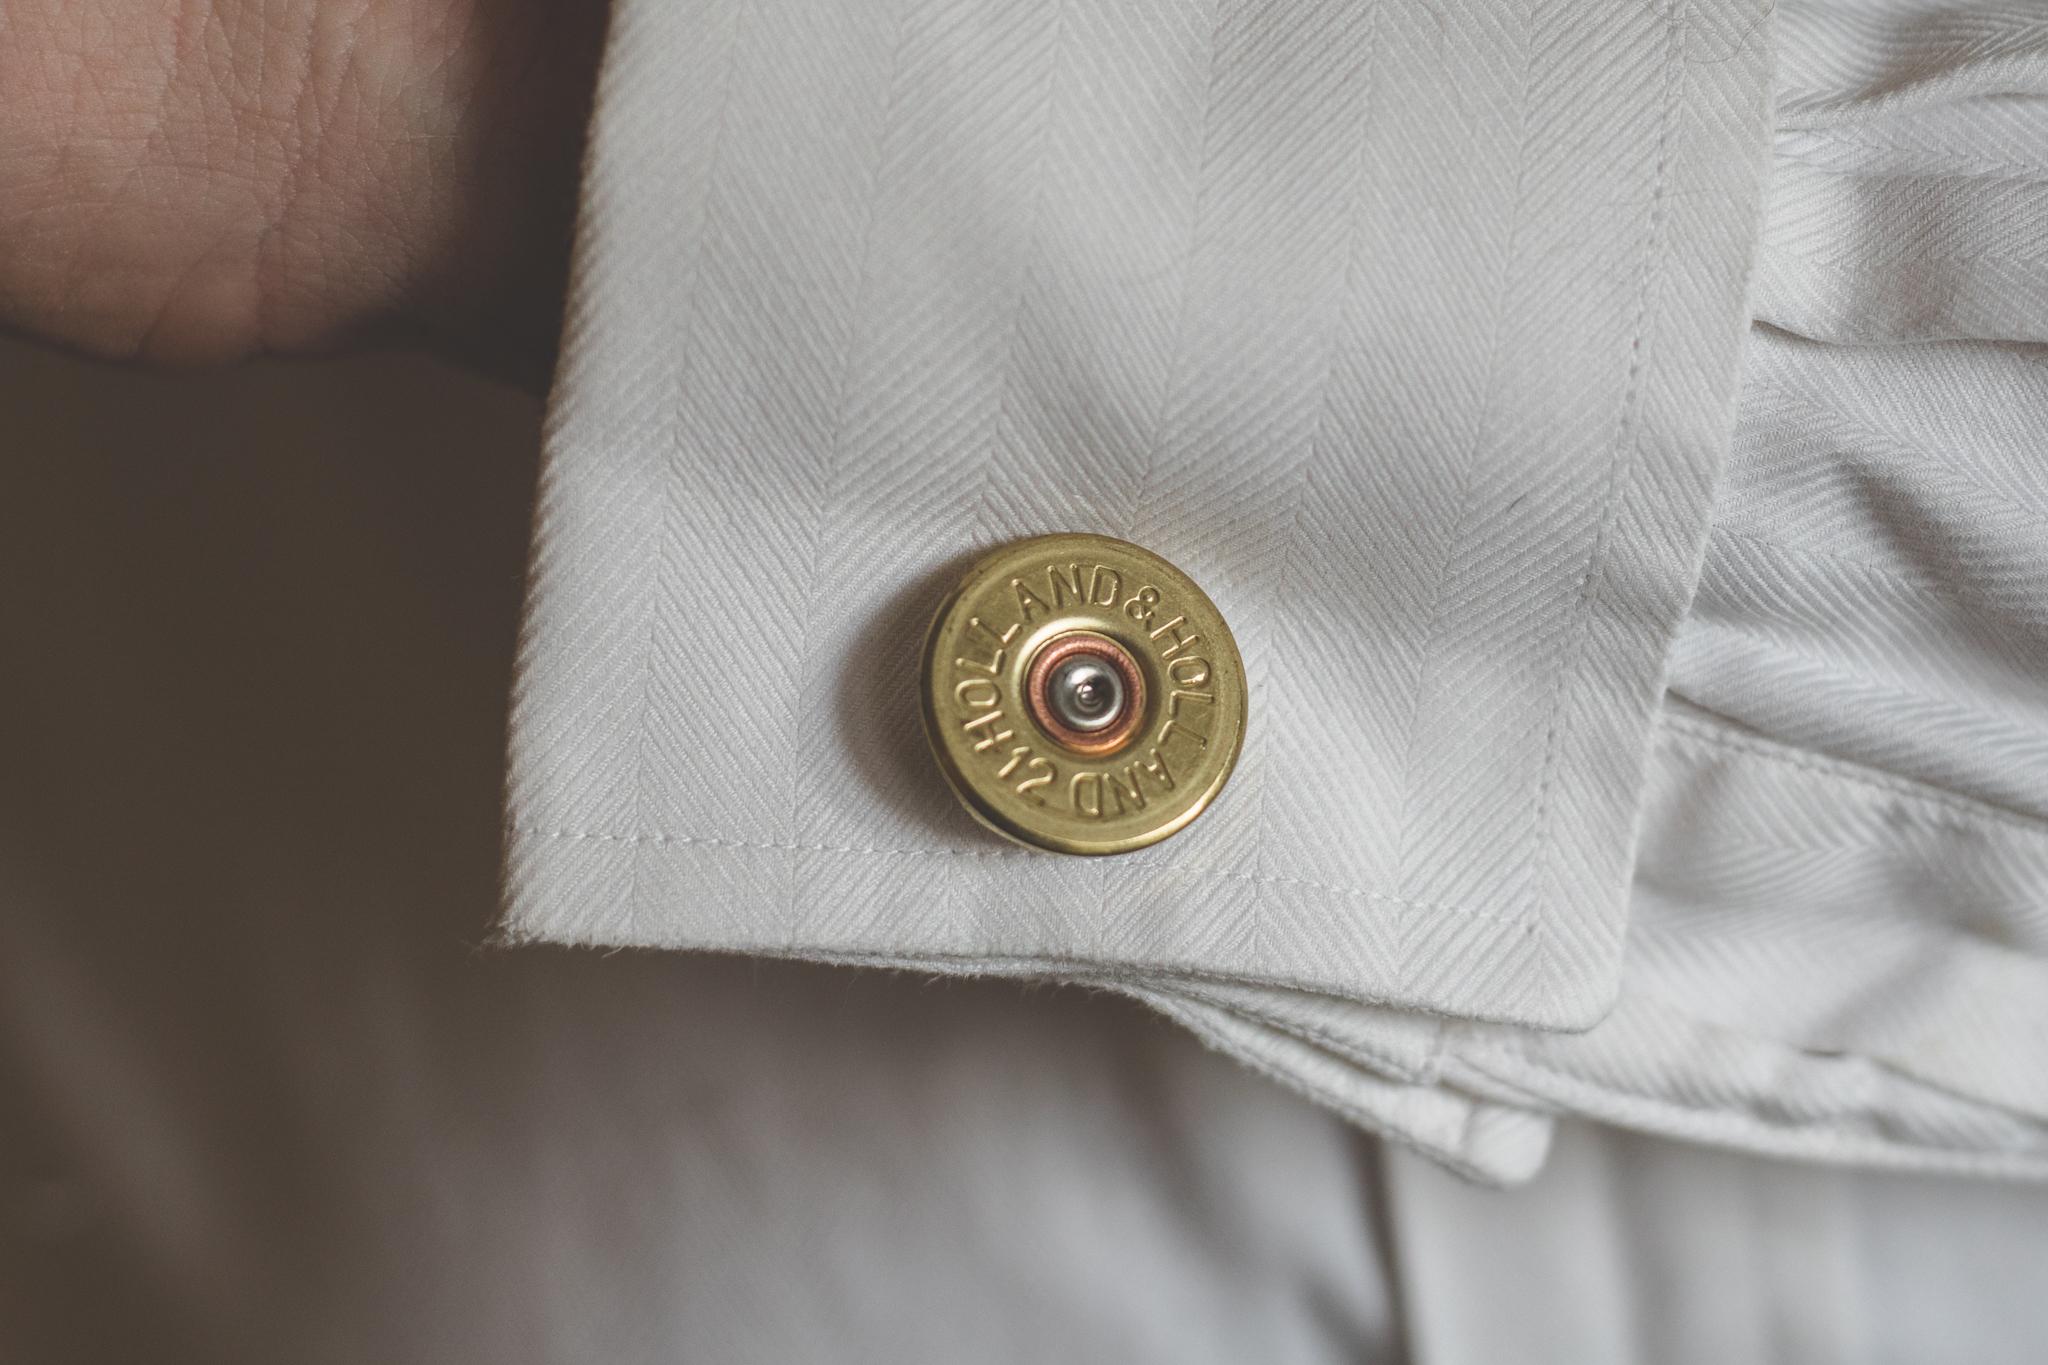 gentlemens cufflinks